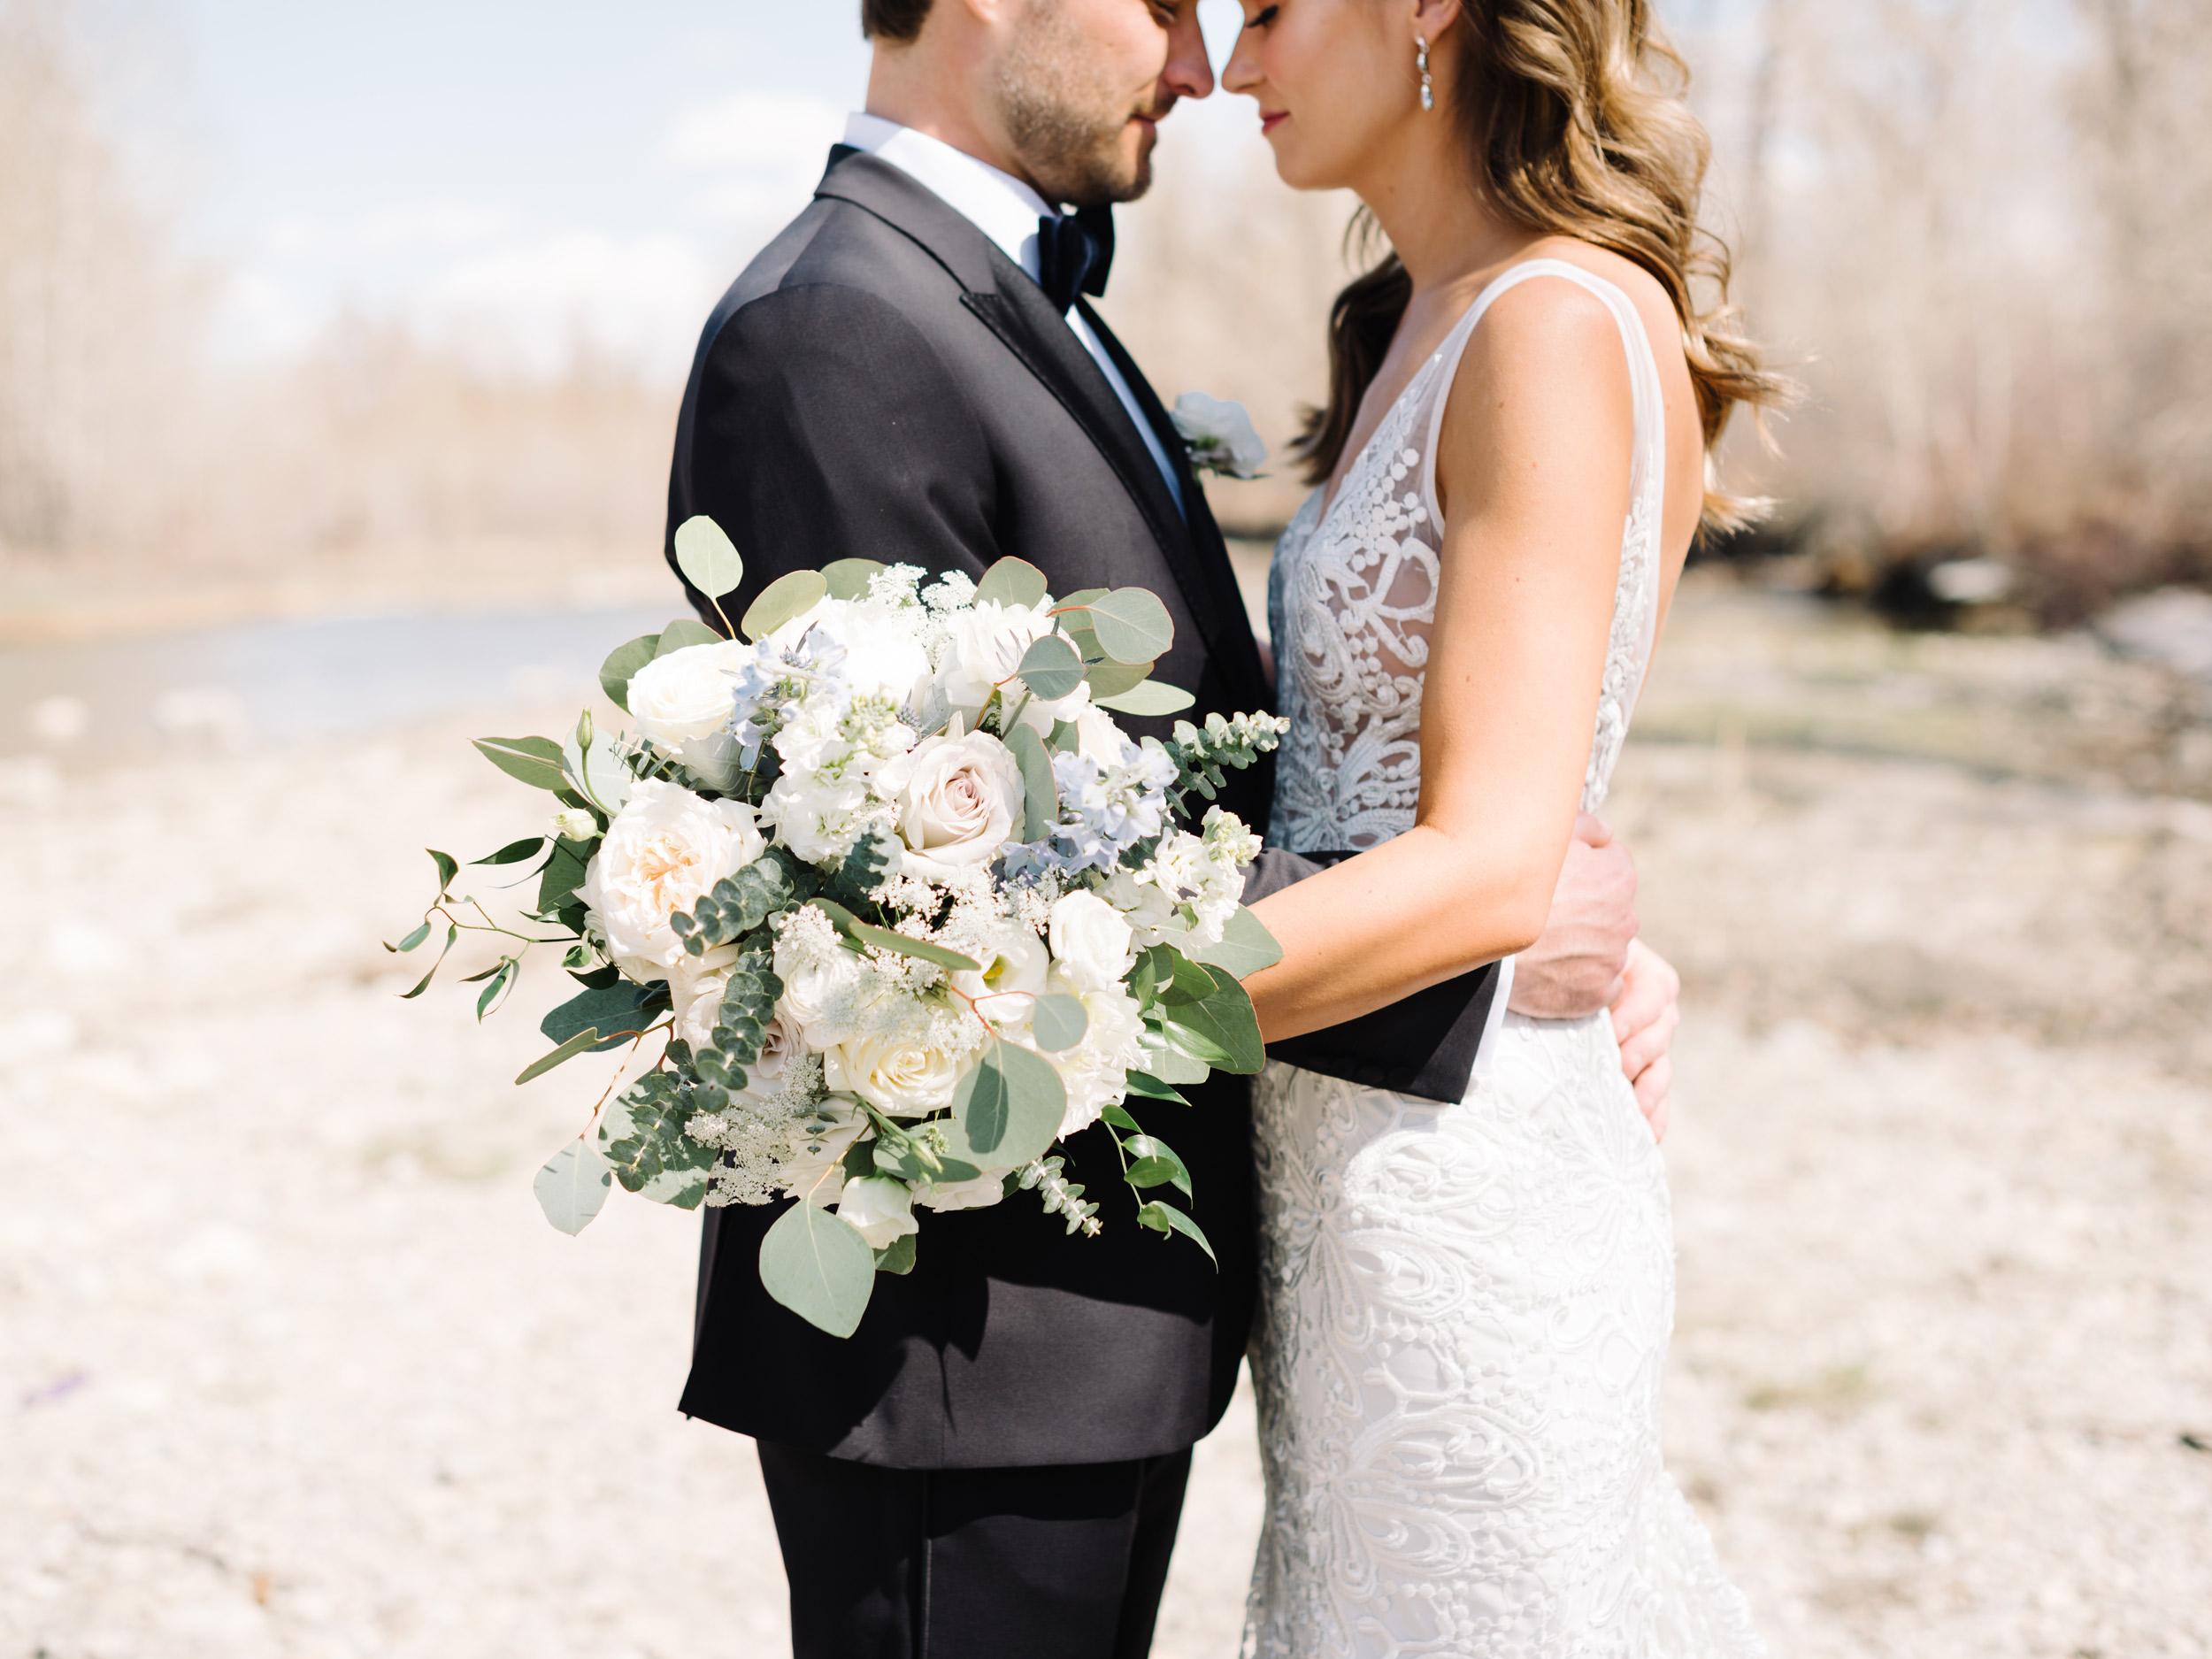 047-The_Lake_House_Calgary_Wedding.jpg